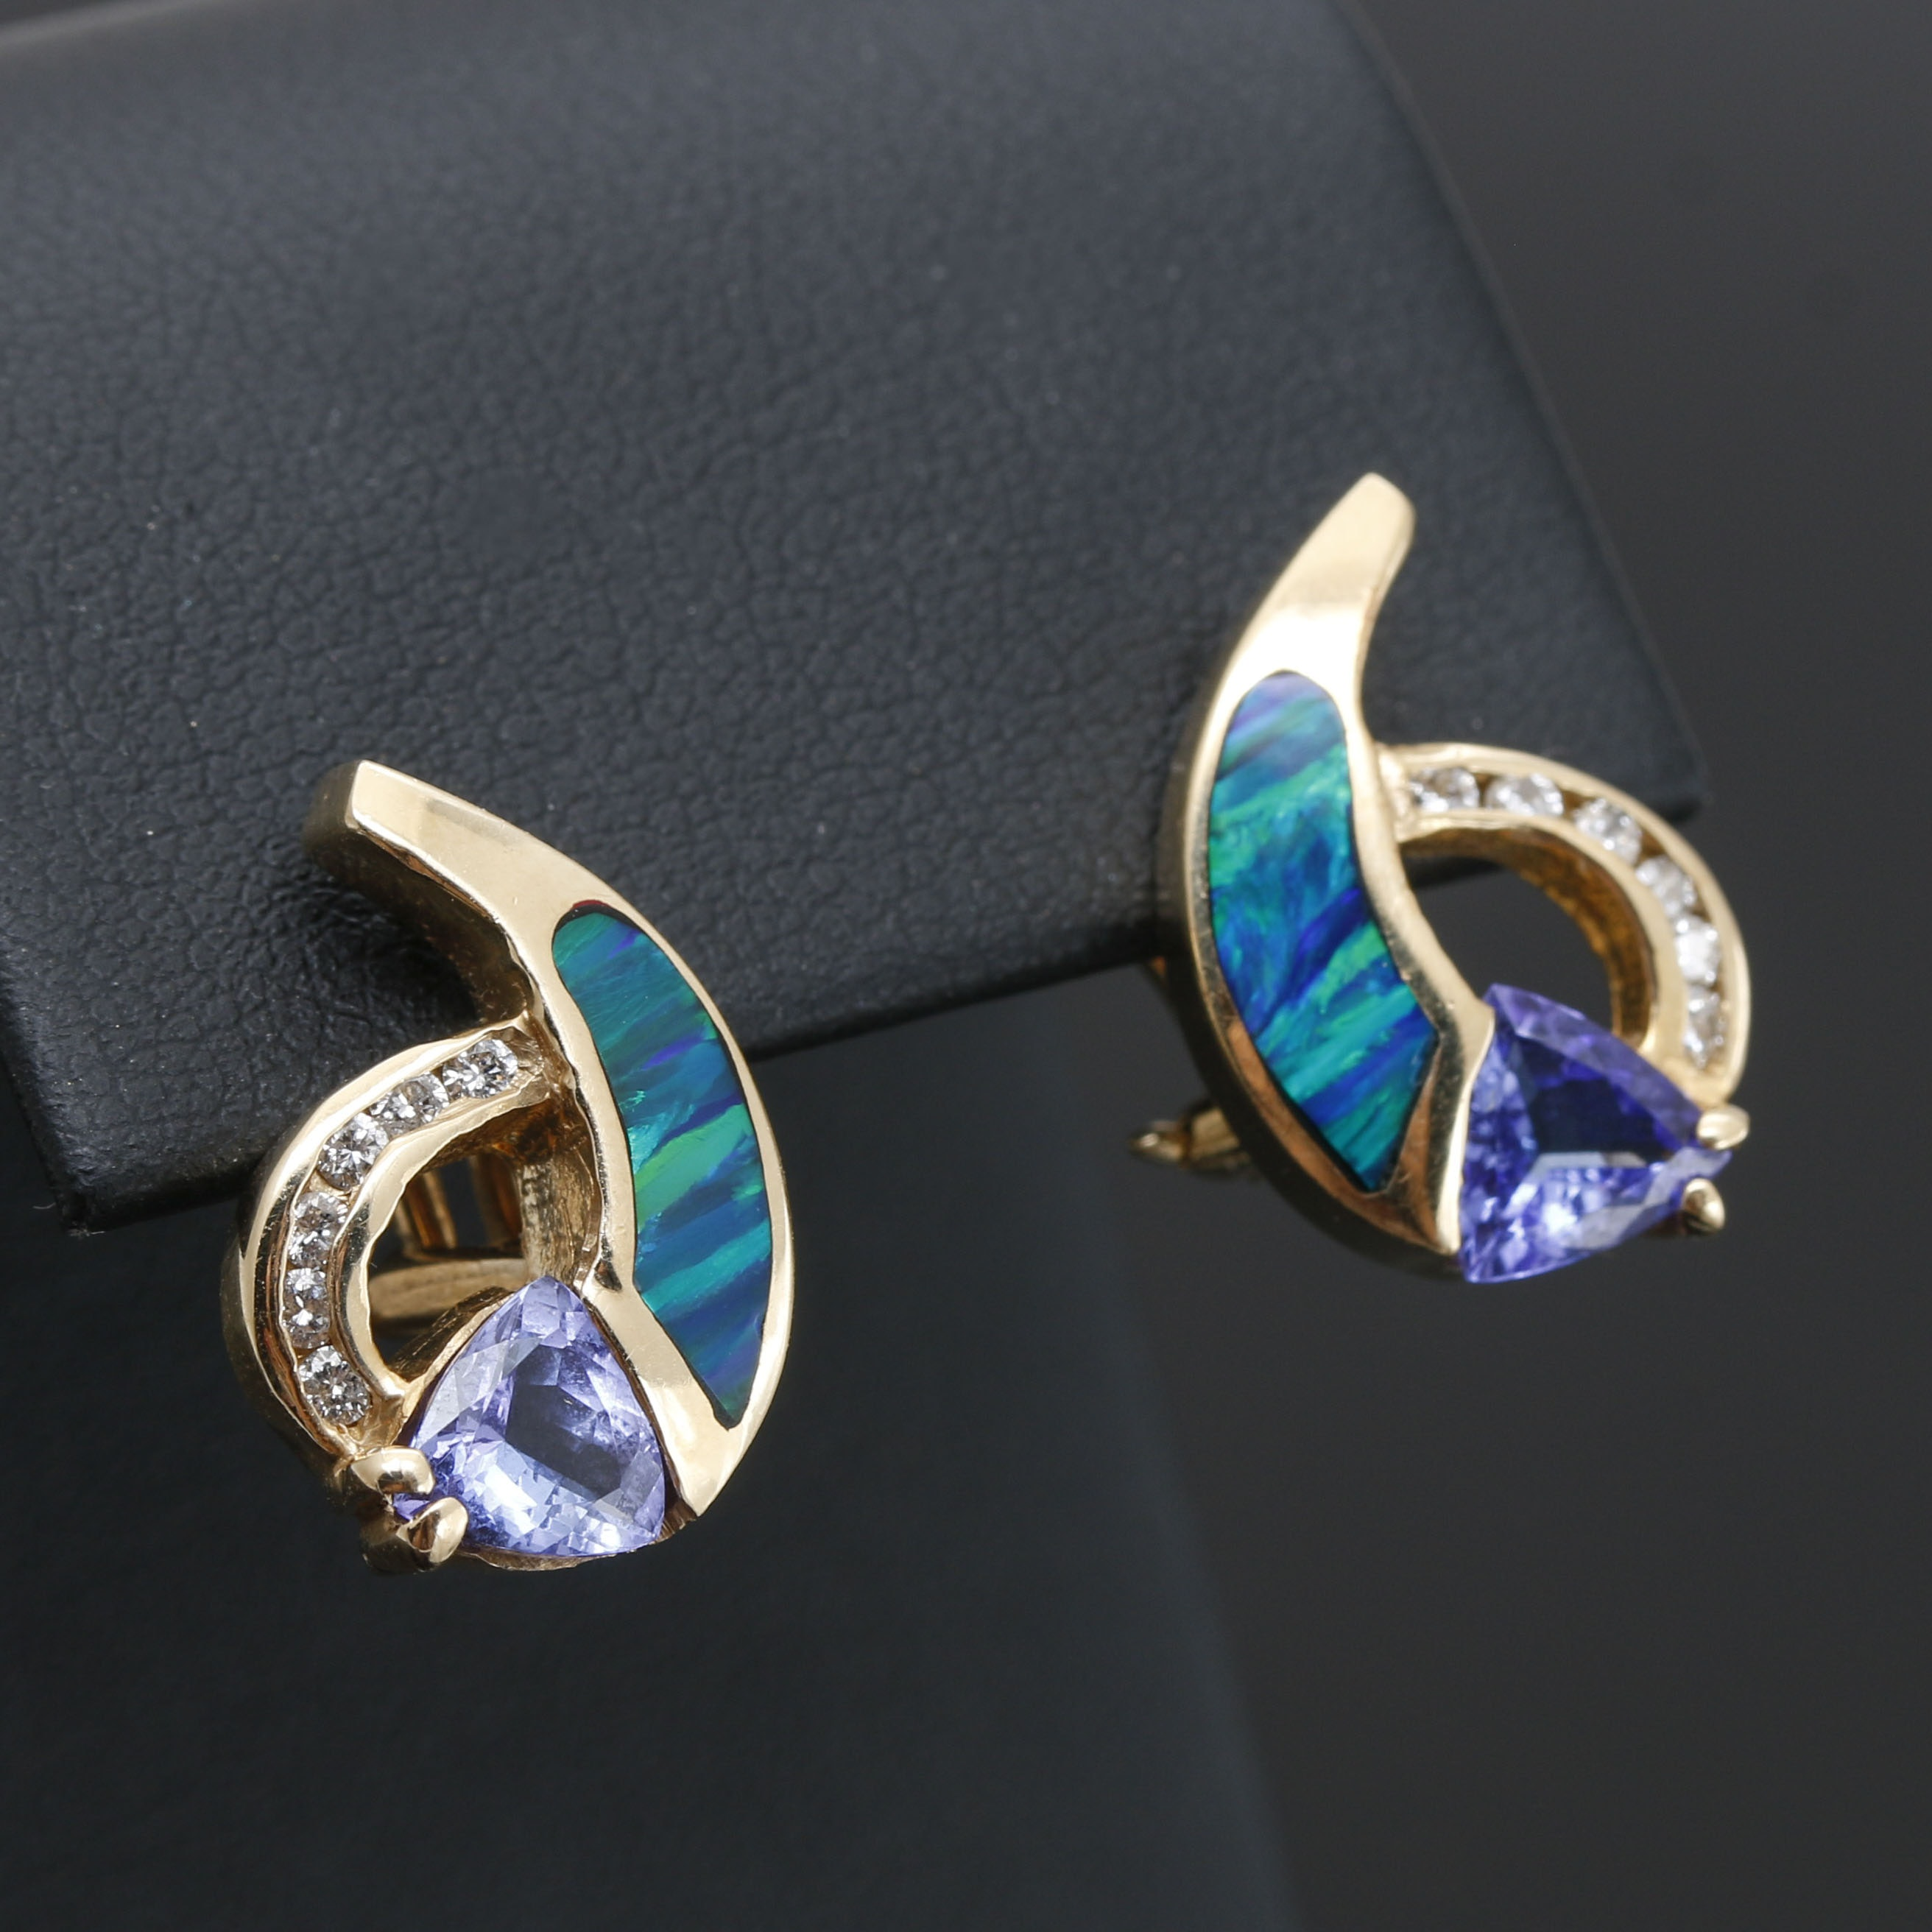 14K Yellow Gold Tanzanite, Opal and Diamond Stud Earrings